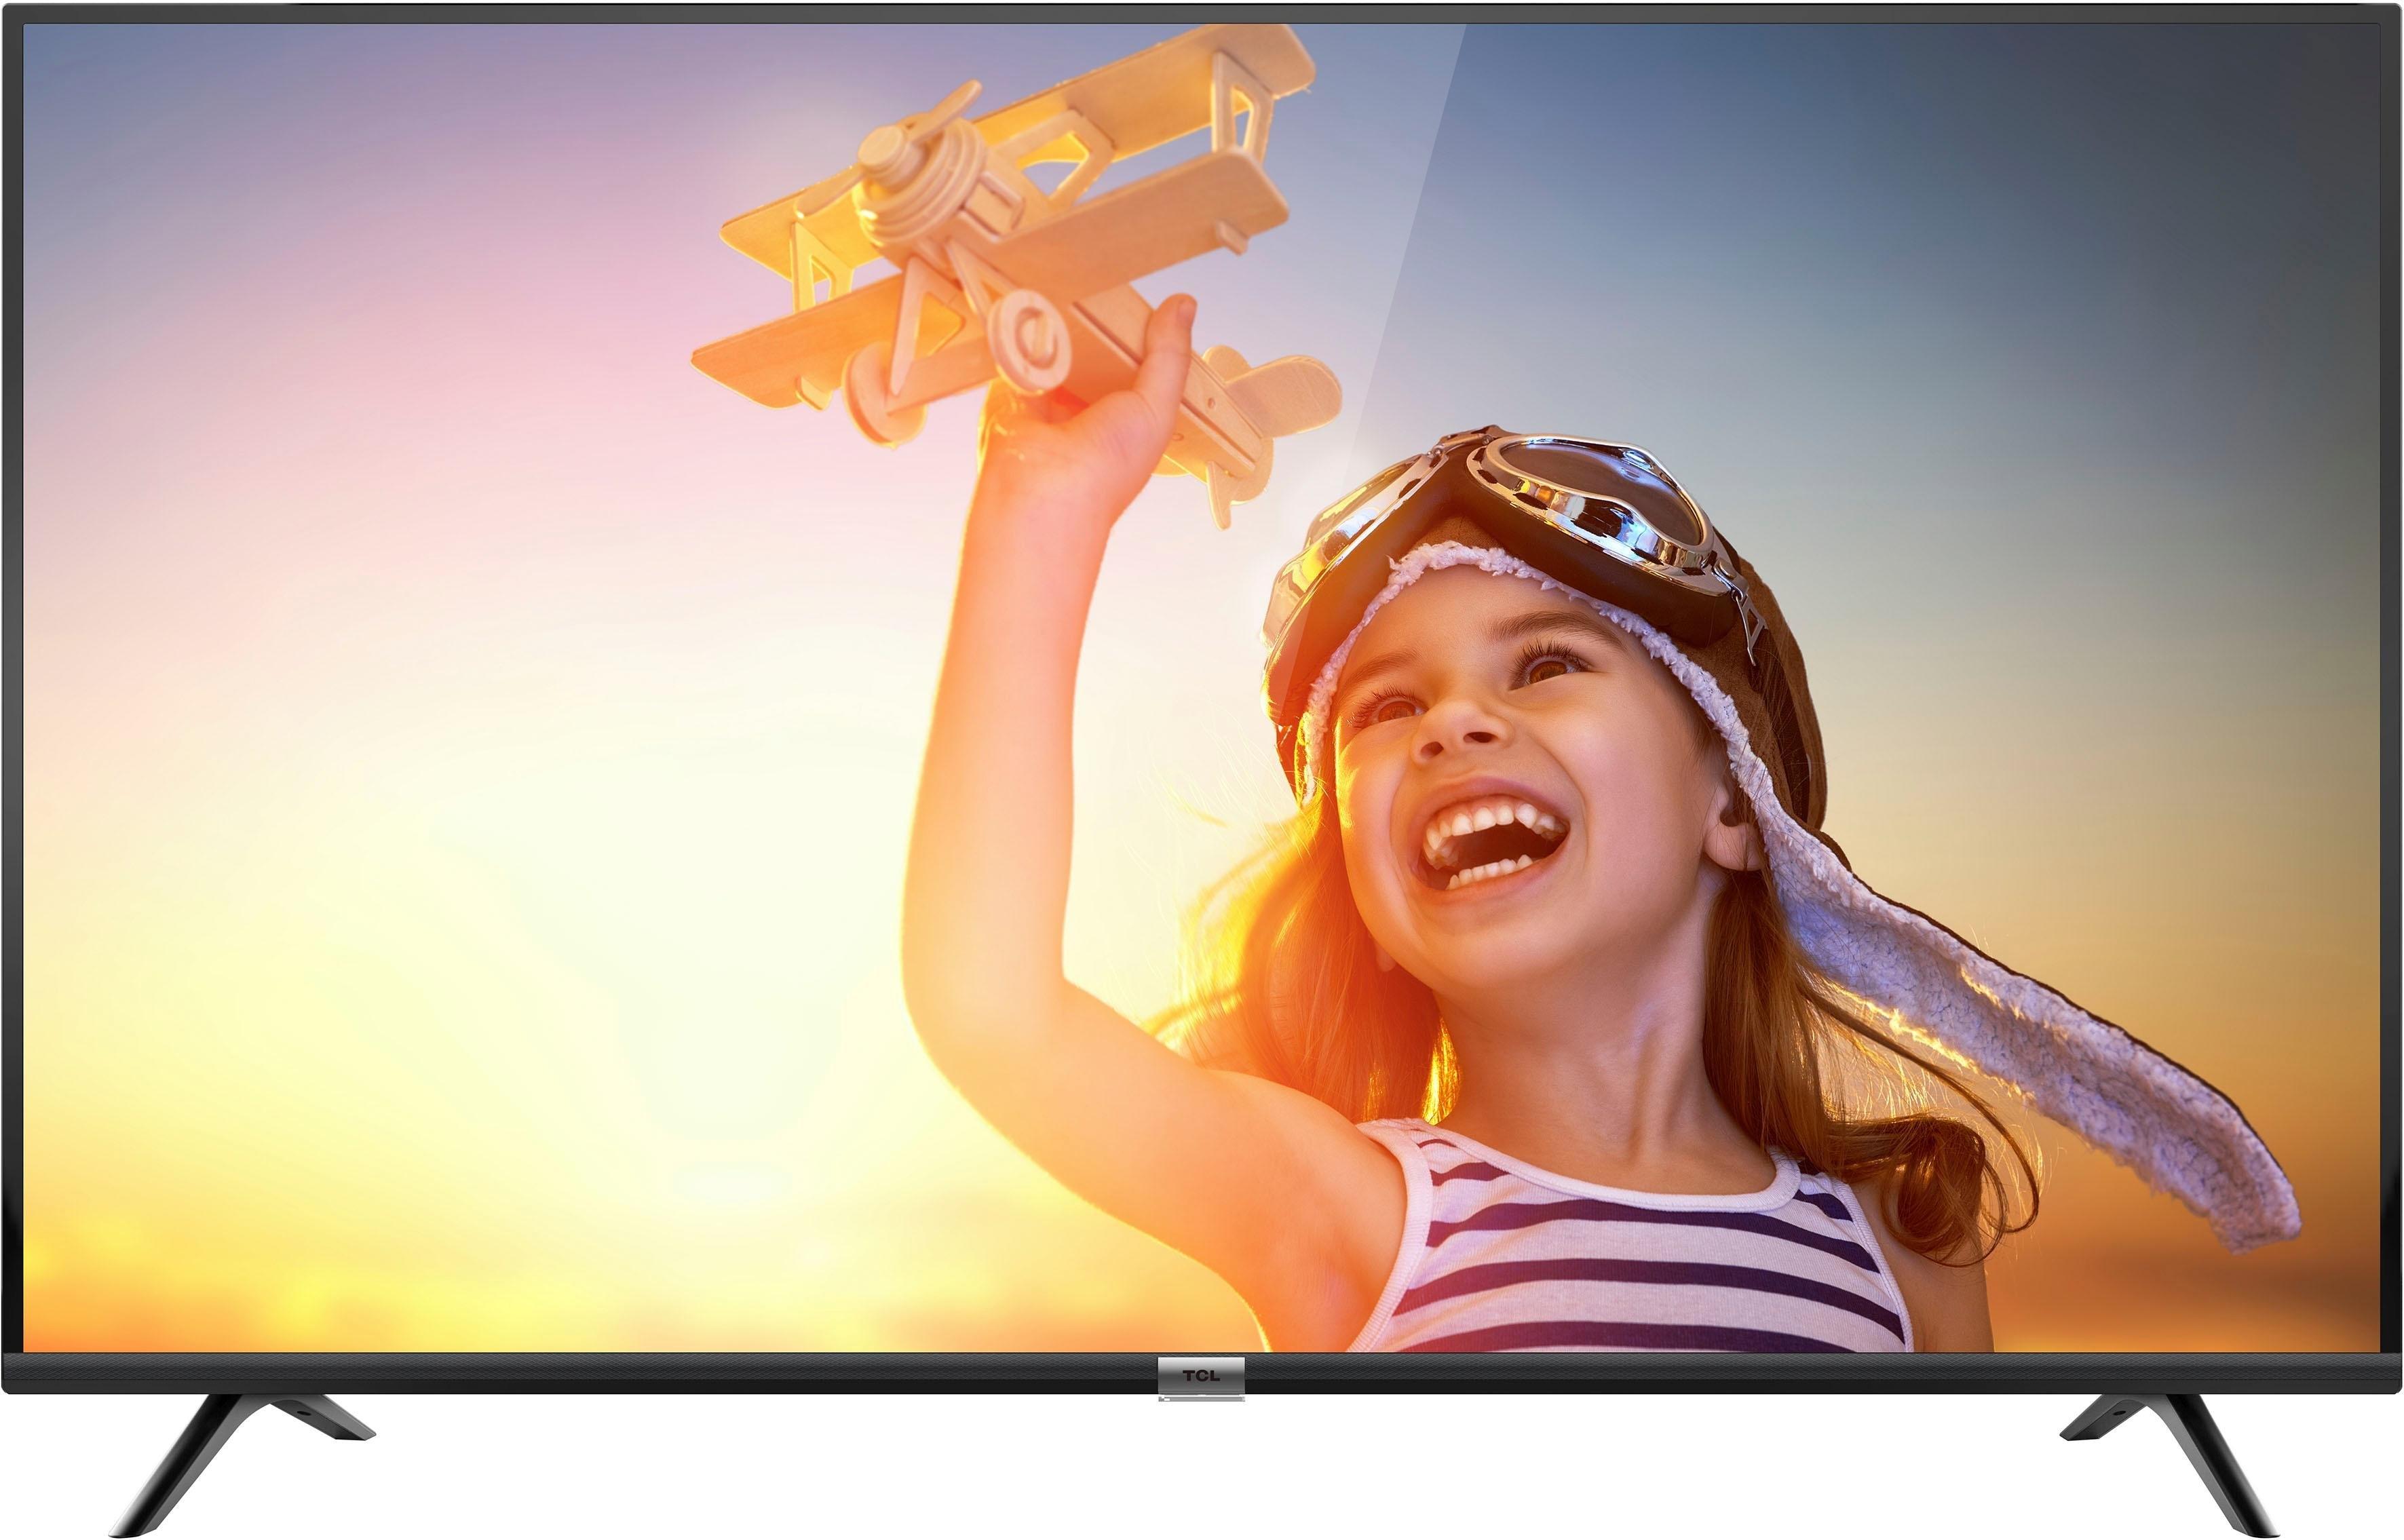 Tcl 43DB600 led-tv (108 cm / 43 inch), 4K Ultra HD, smart-tv nu online kopen bij OTTO